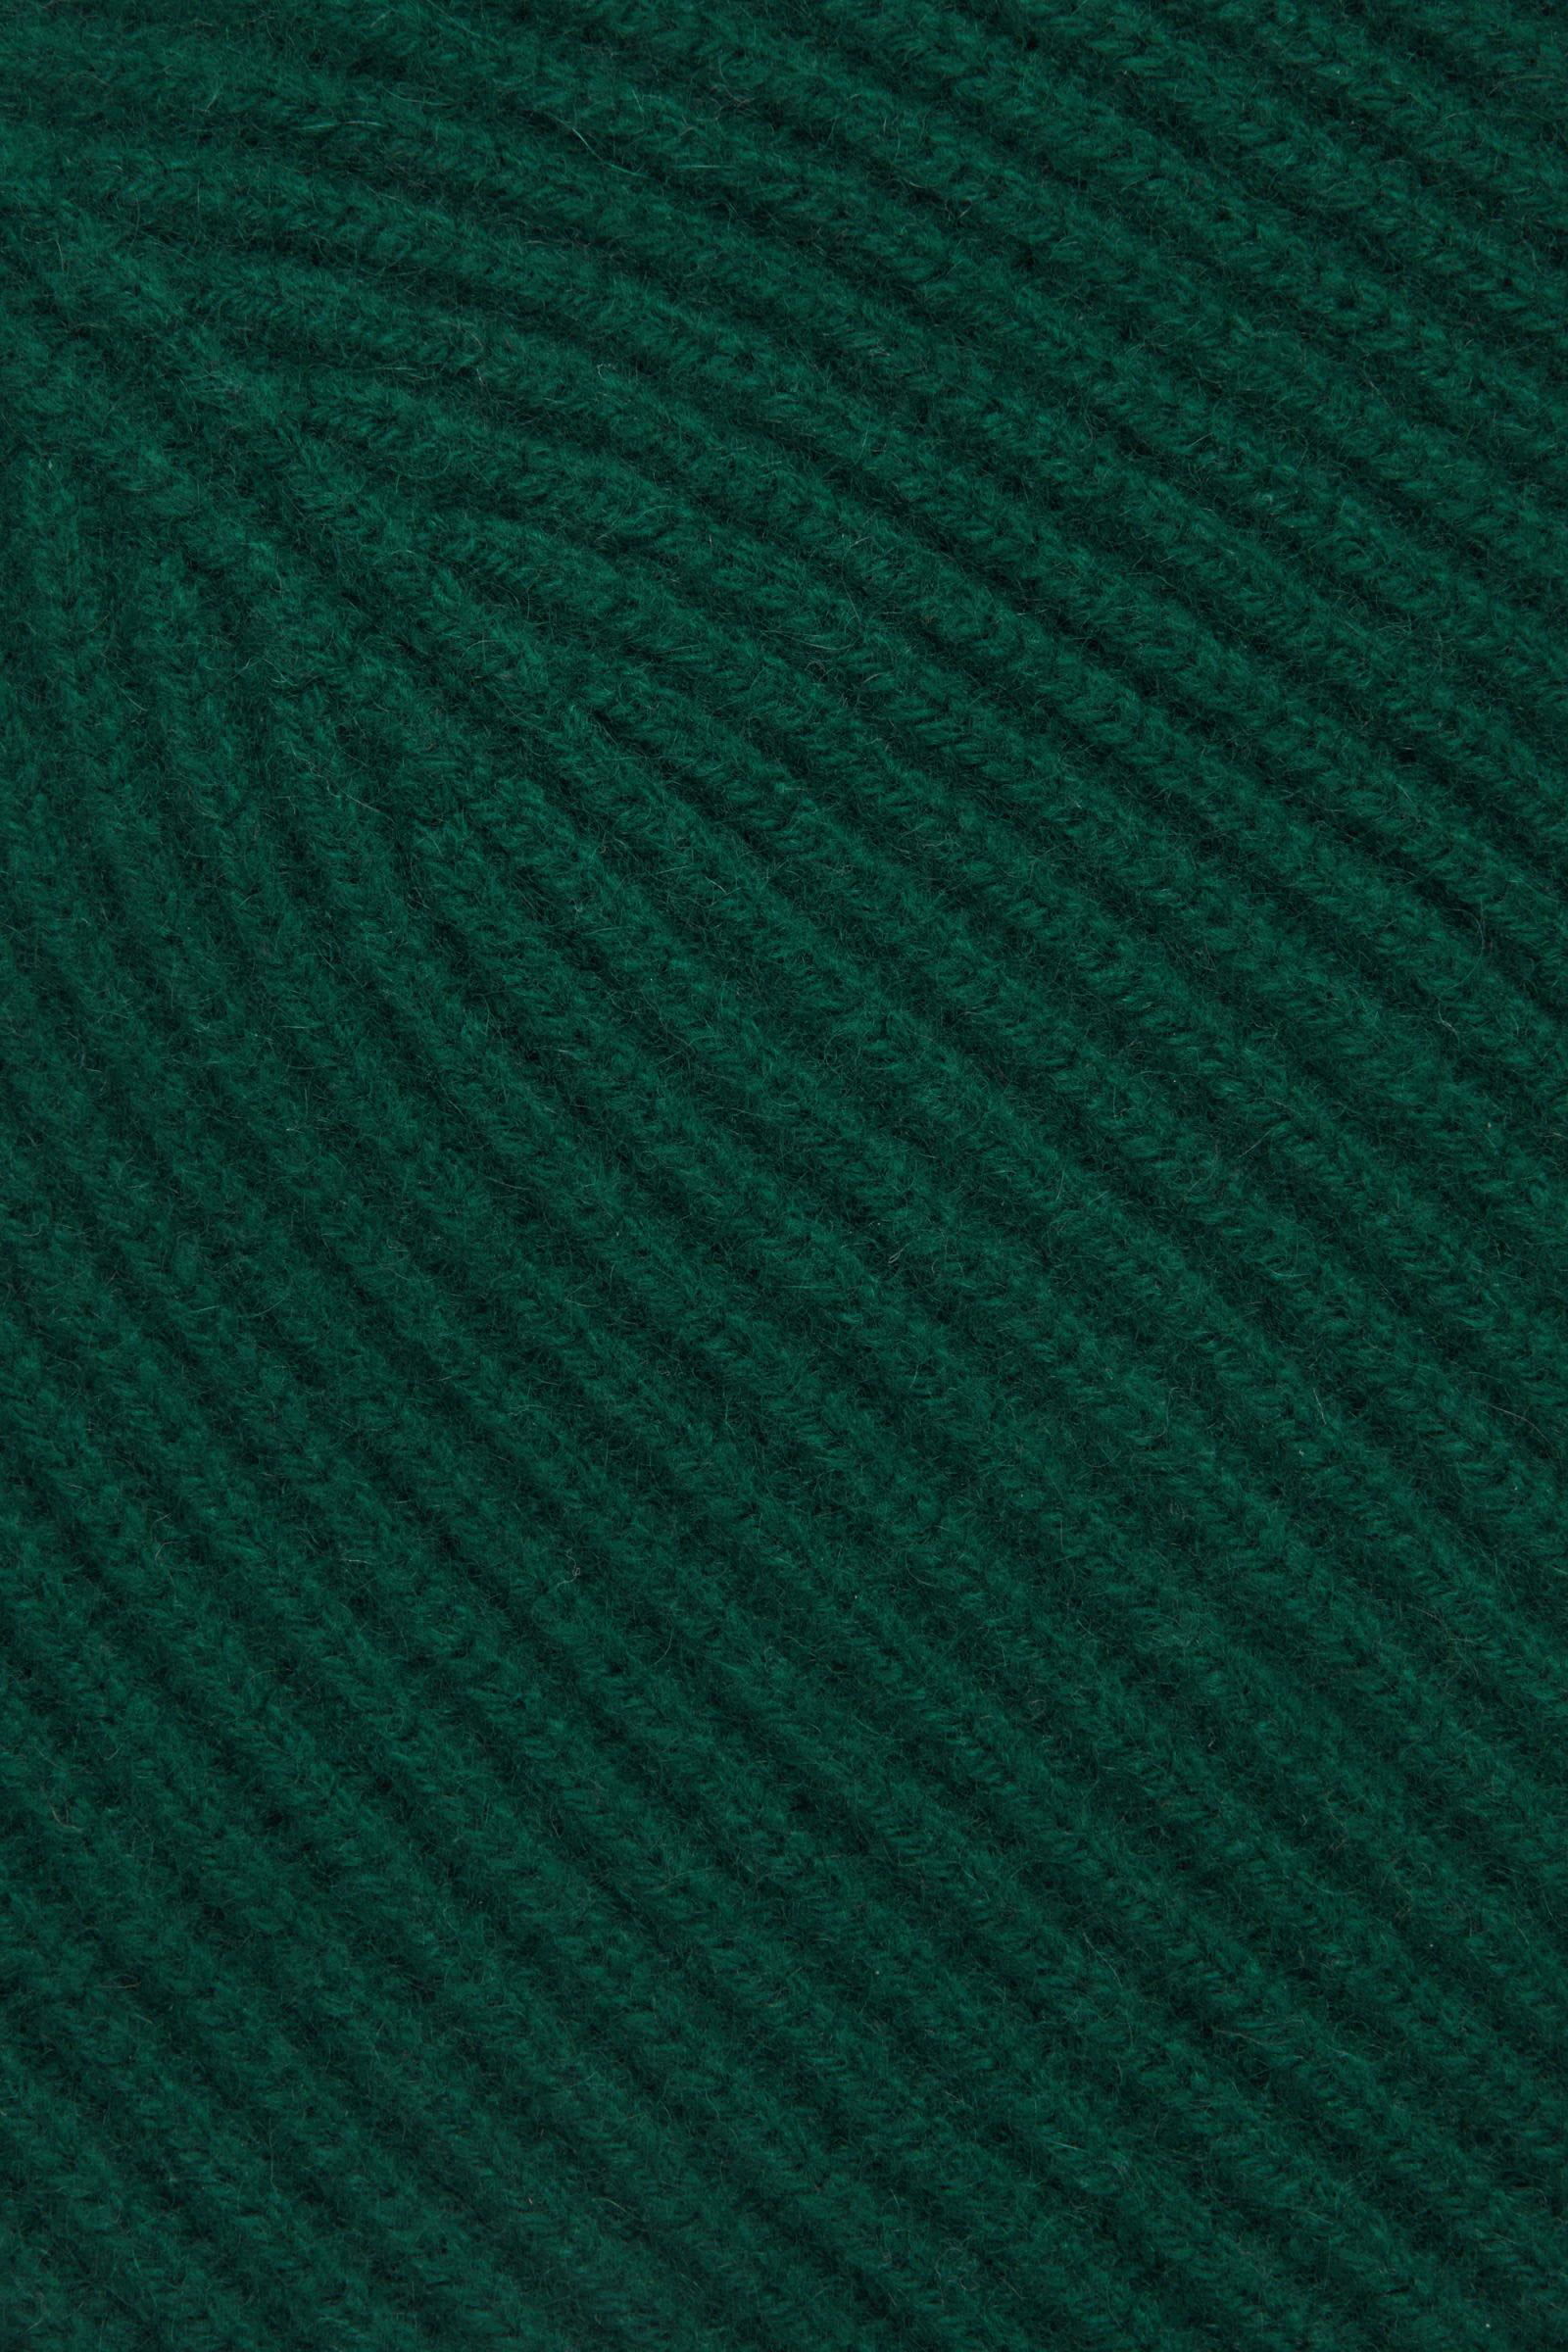 COS 리브드 캐시미어 햇의 그린컬러 Detail입니다.